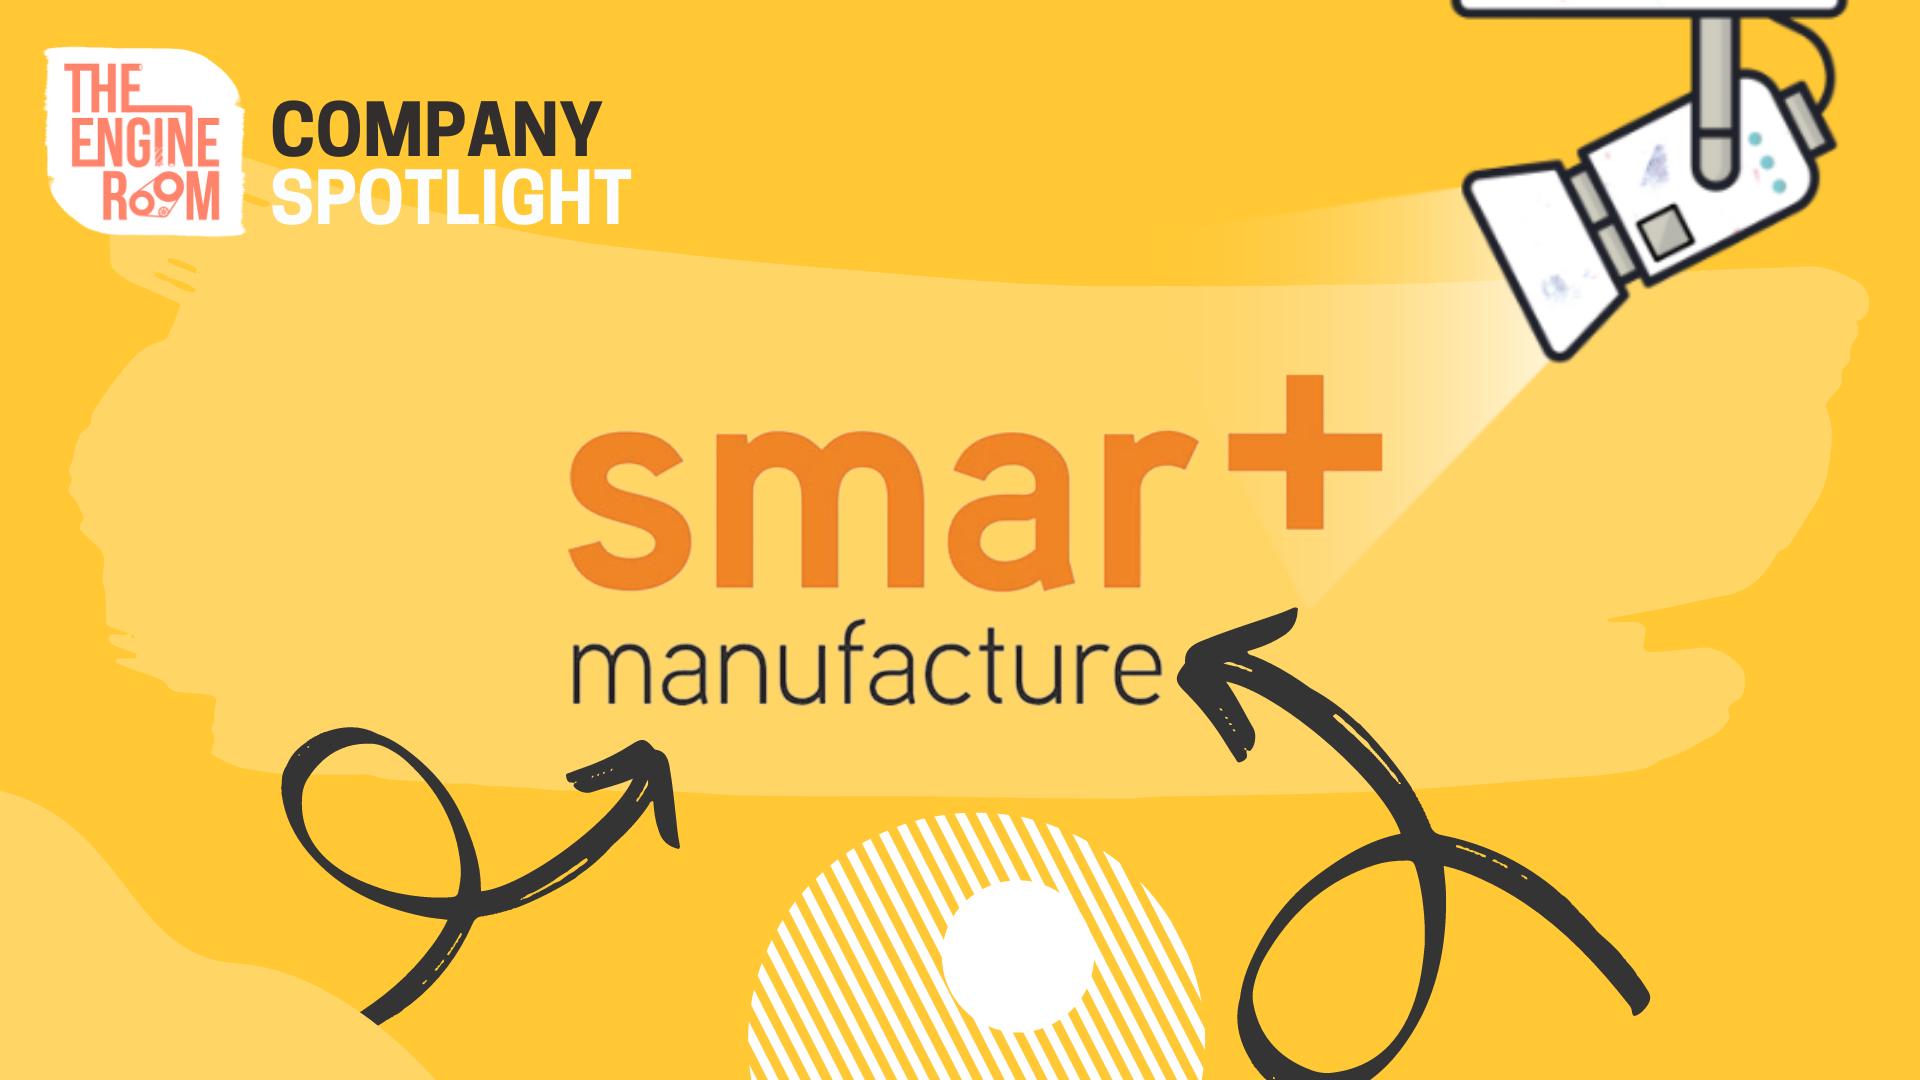 THE ENGINE ROOM - Company Spotlight - Sara Duff Smart Manufacture